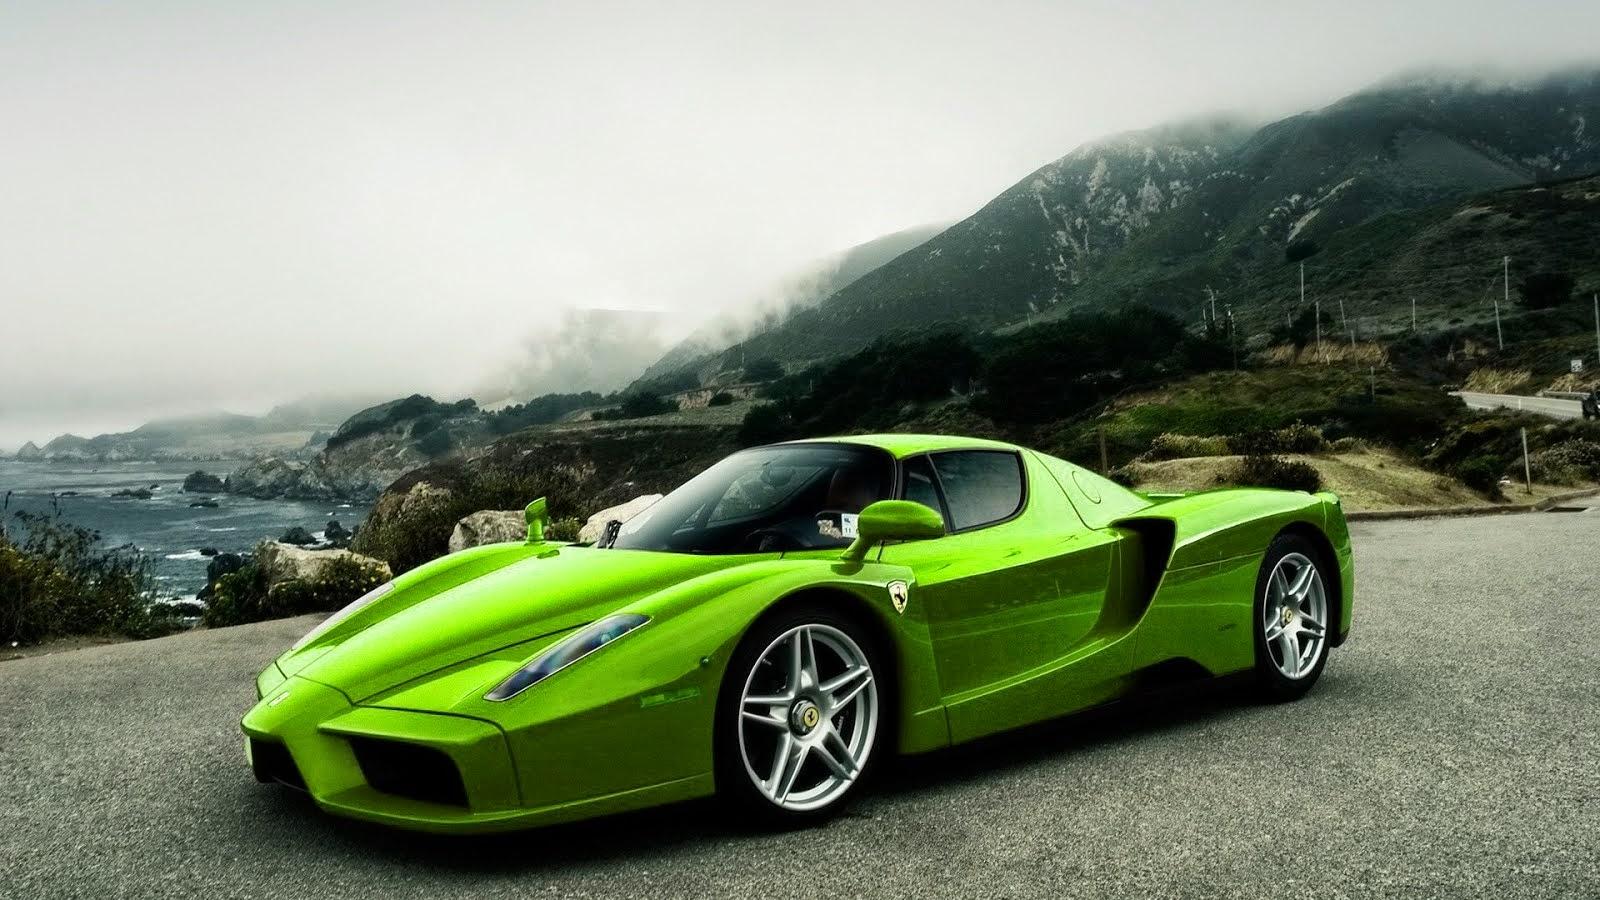 Ferrari Enzo HD Wallpapers | Car Backgrounds | HD ...